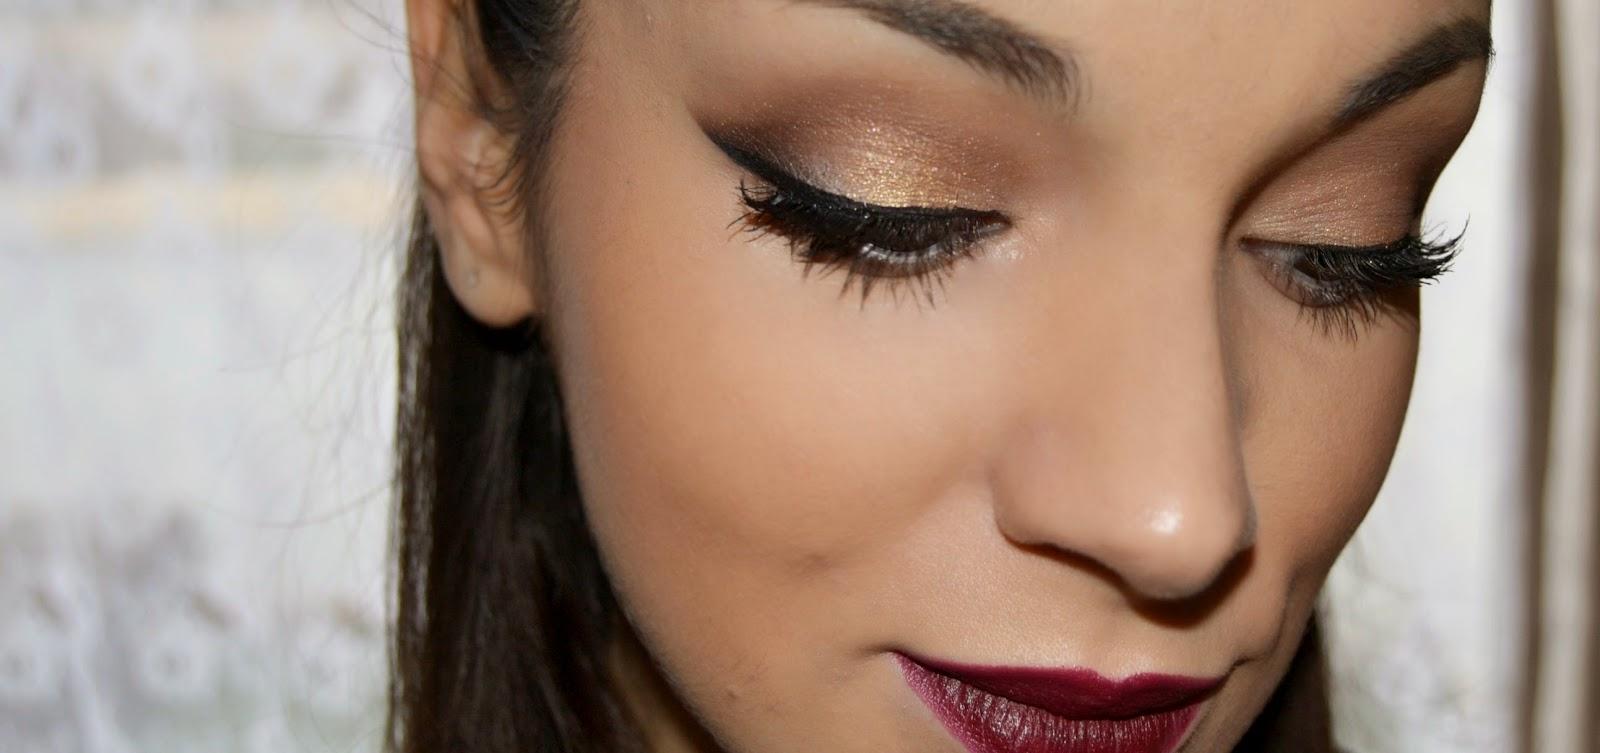 Ratolina Gold Lights Maquillaje Para Fiestas O Eventos - Maquillaje-para-eventos